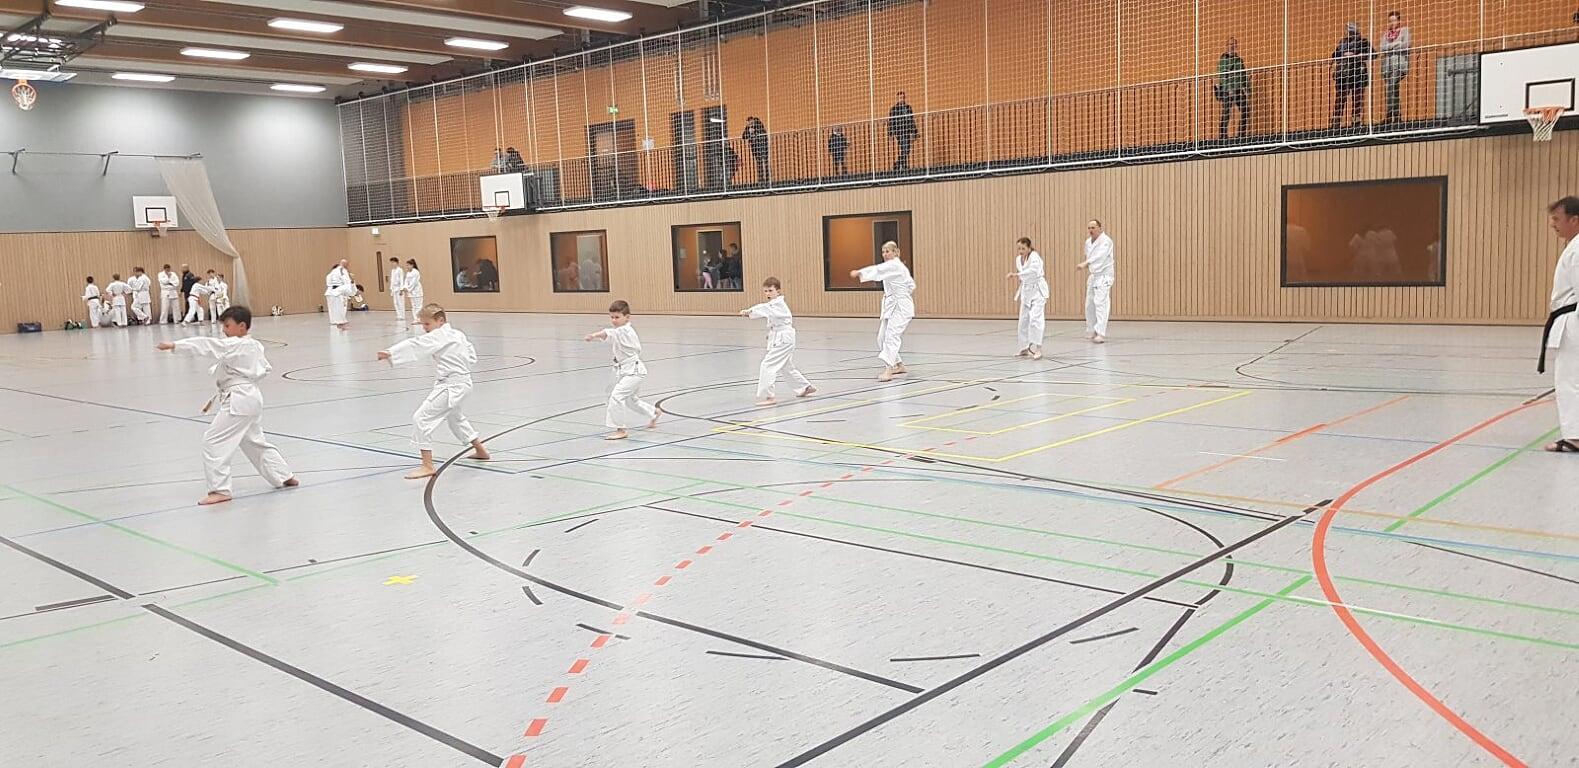 Gürtelprüfung 2019 - Karate SV Ingolstadt - Haunwöhr